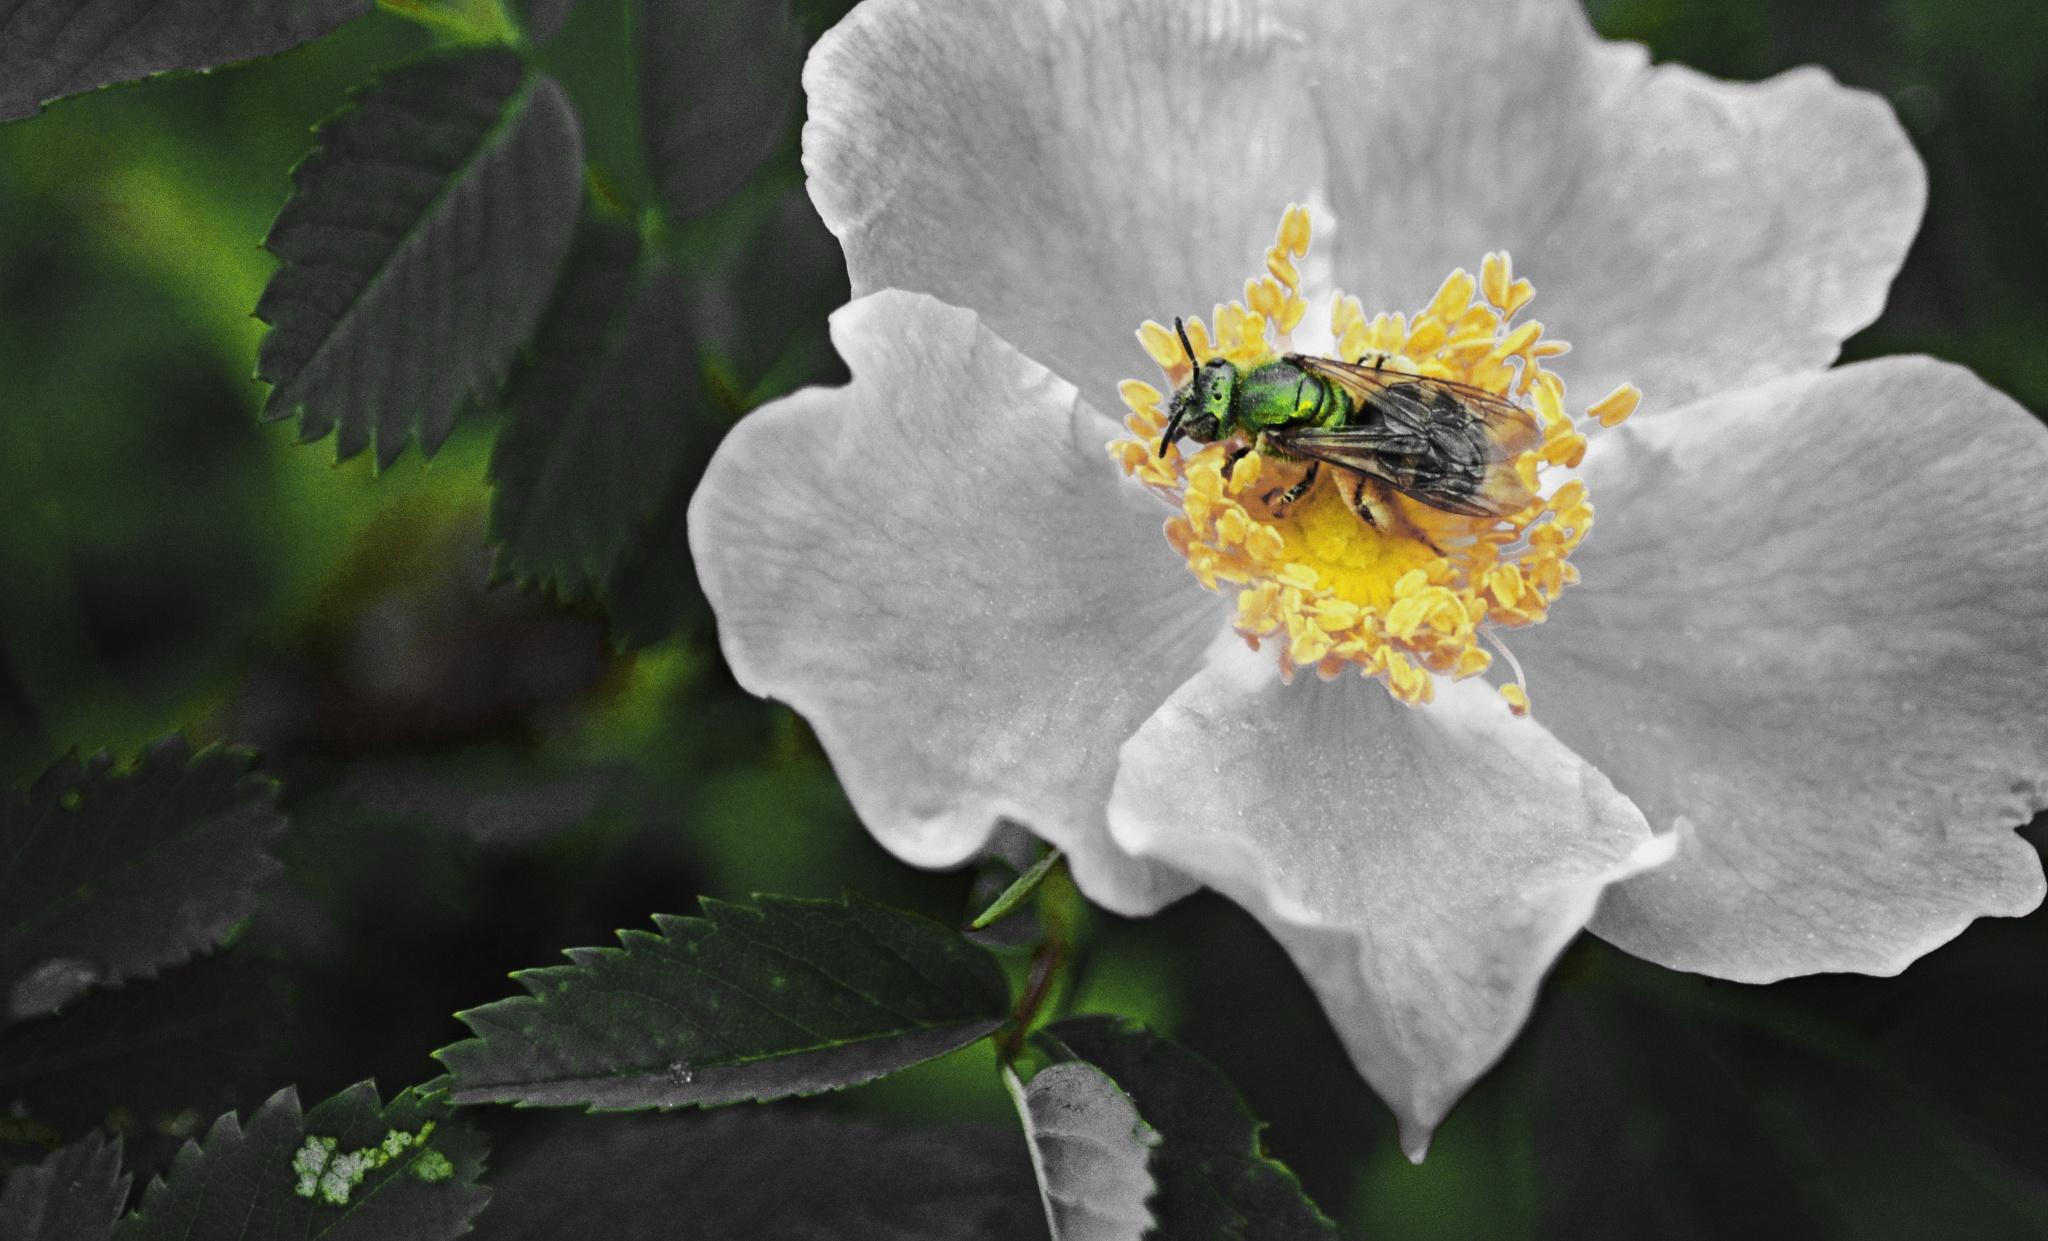 Green Sweat Bee by William C. Burton